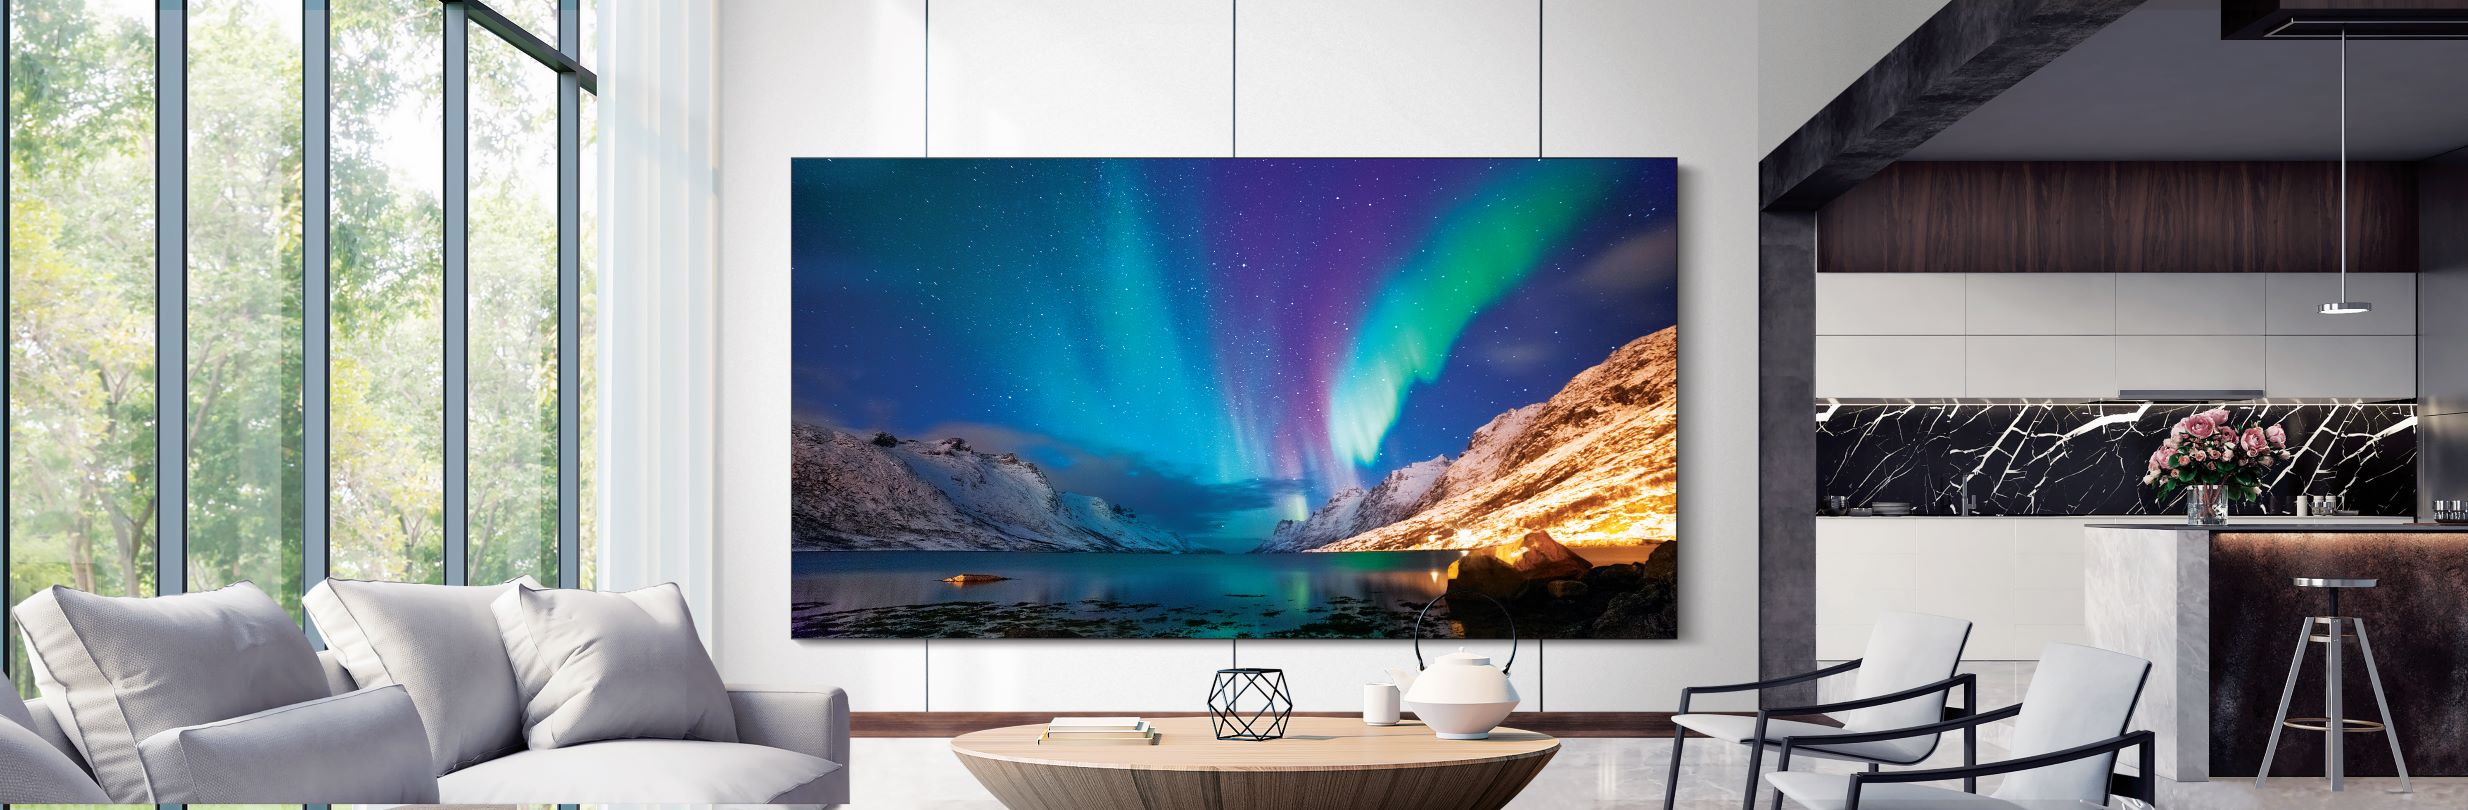 Больше, чем просто телевизоры: Samsung представила модели 2021 года MICRO LED и Neo QLED